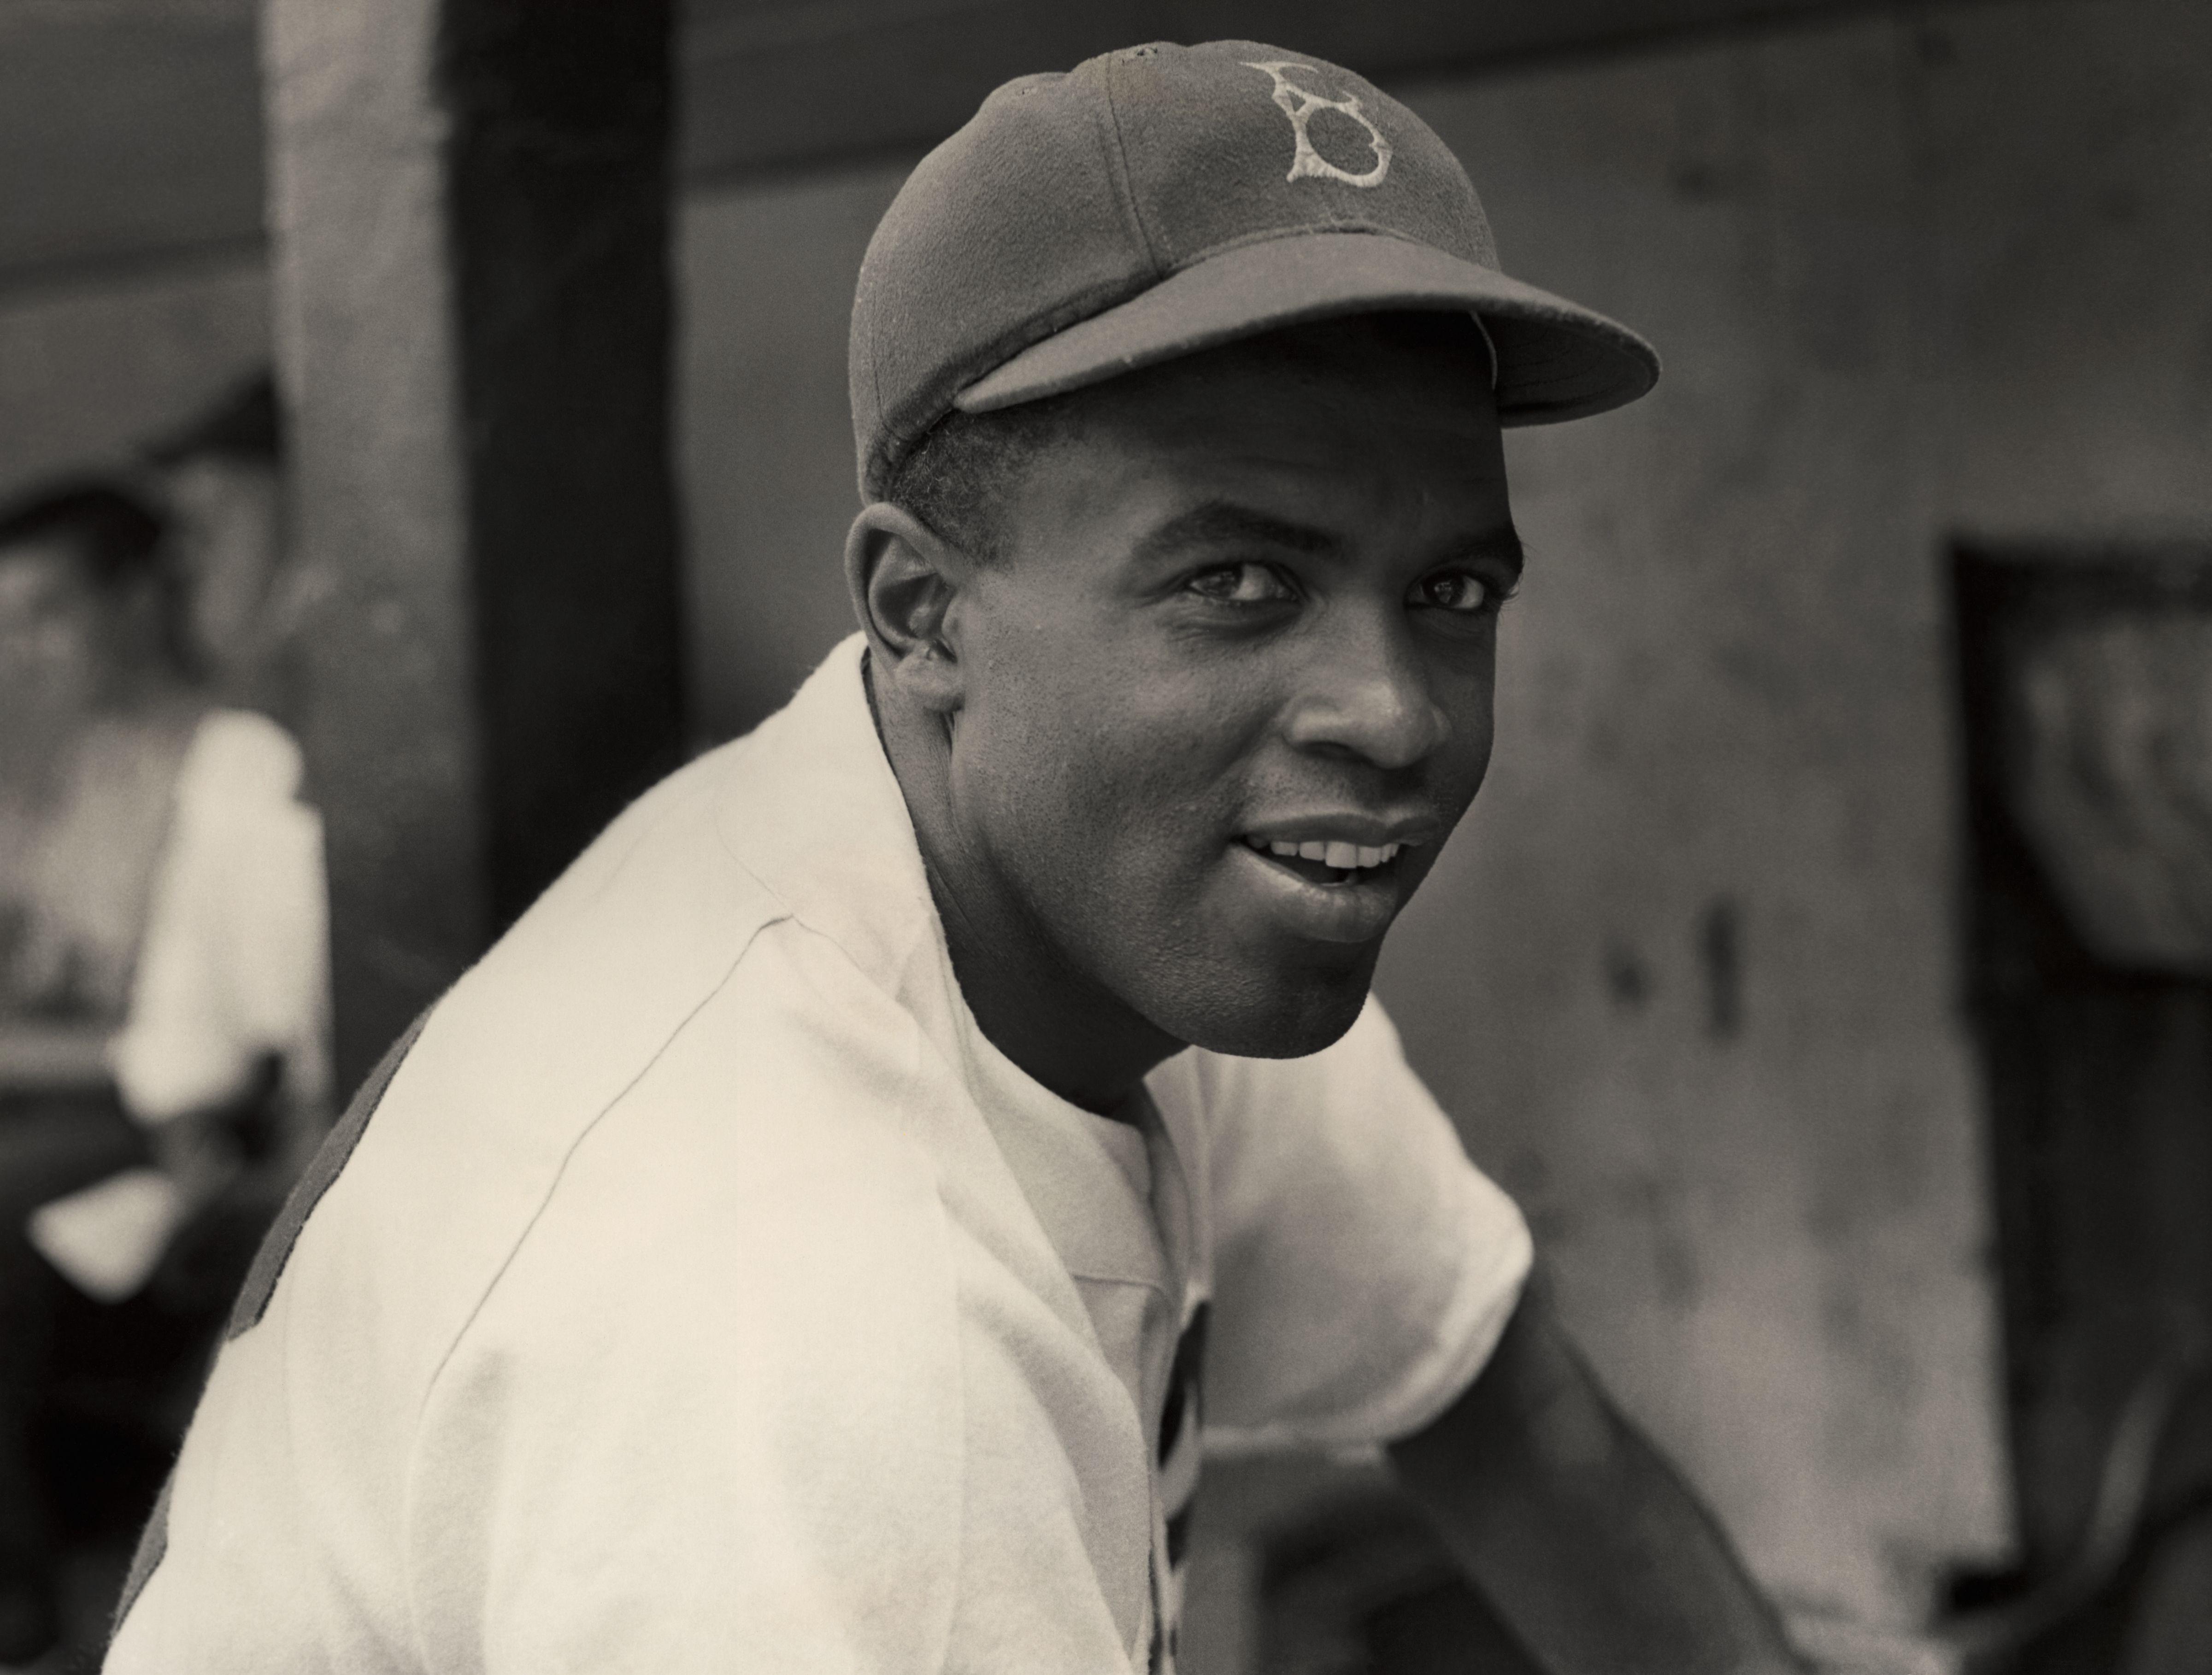 circa 1945: A portrait of the Brooklyn Dodgers' infielder Jackie Robinson in uniform.